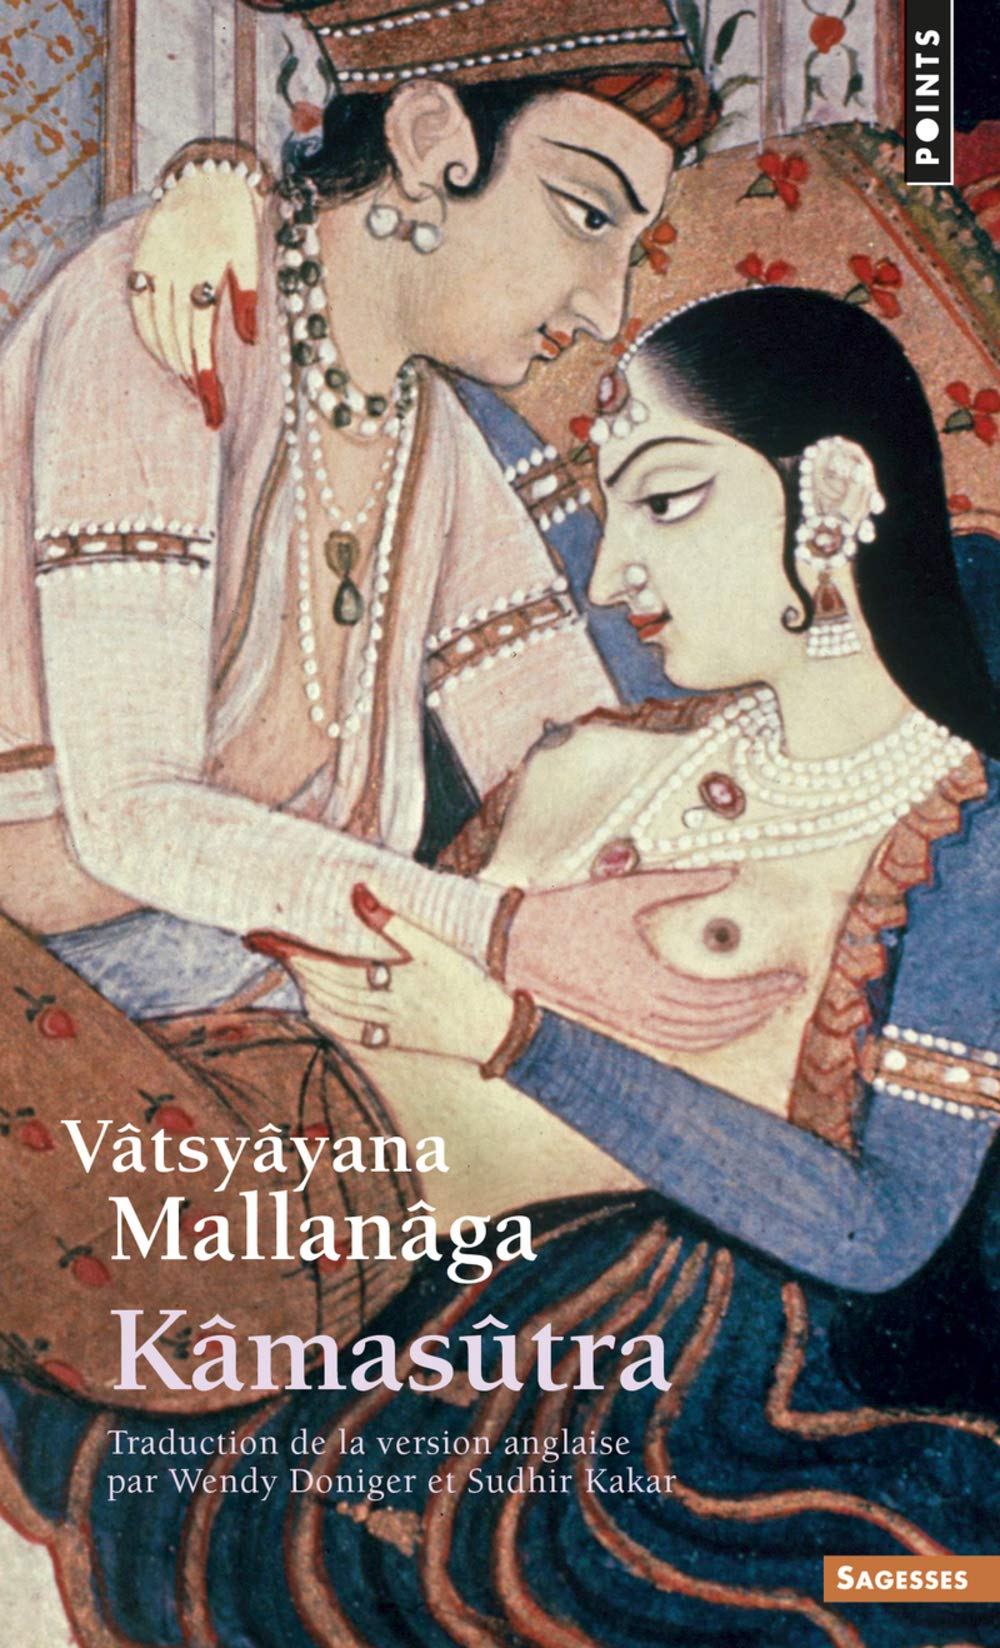 Kâmasûtra (Anglais) Poche – 9 septembre 2010 Vatsyayana Mallanaga Points 2757819380 Religion et société